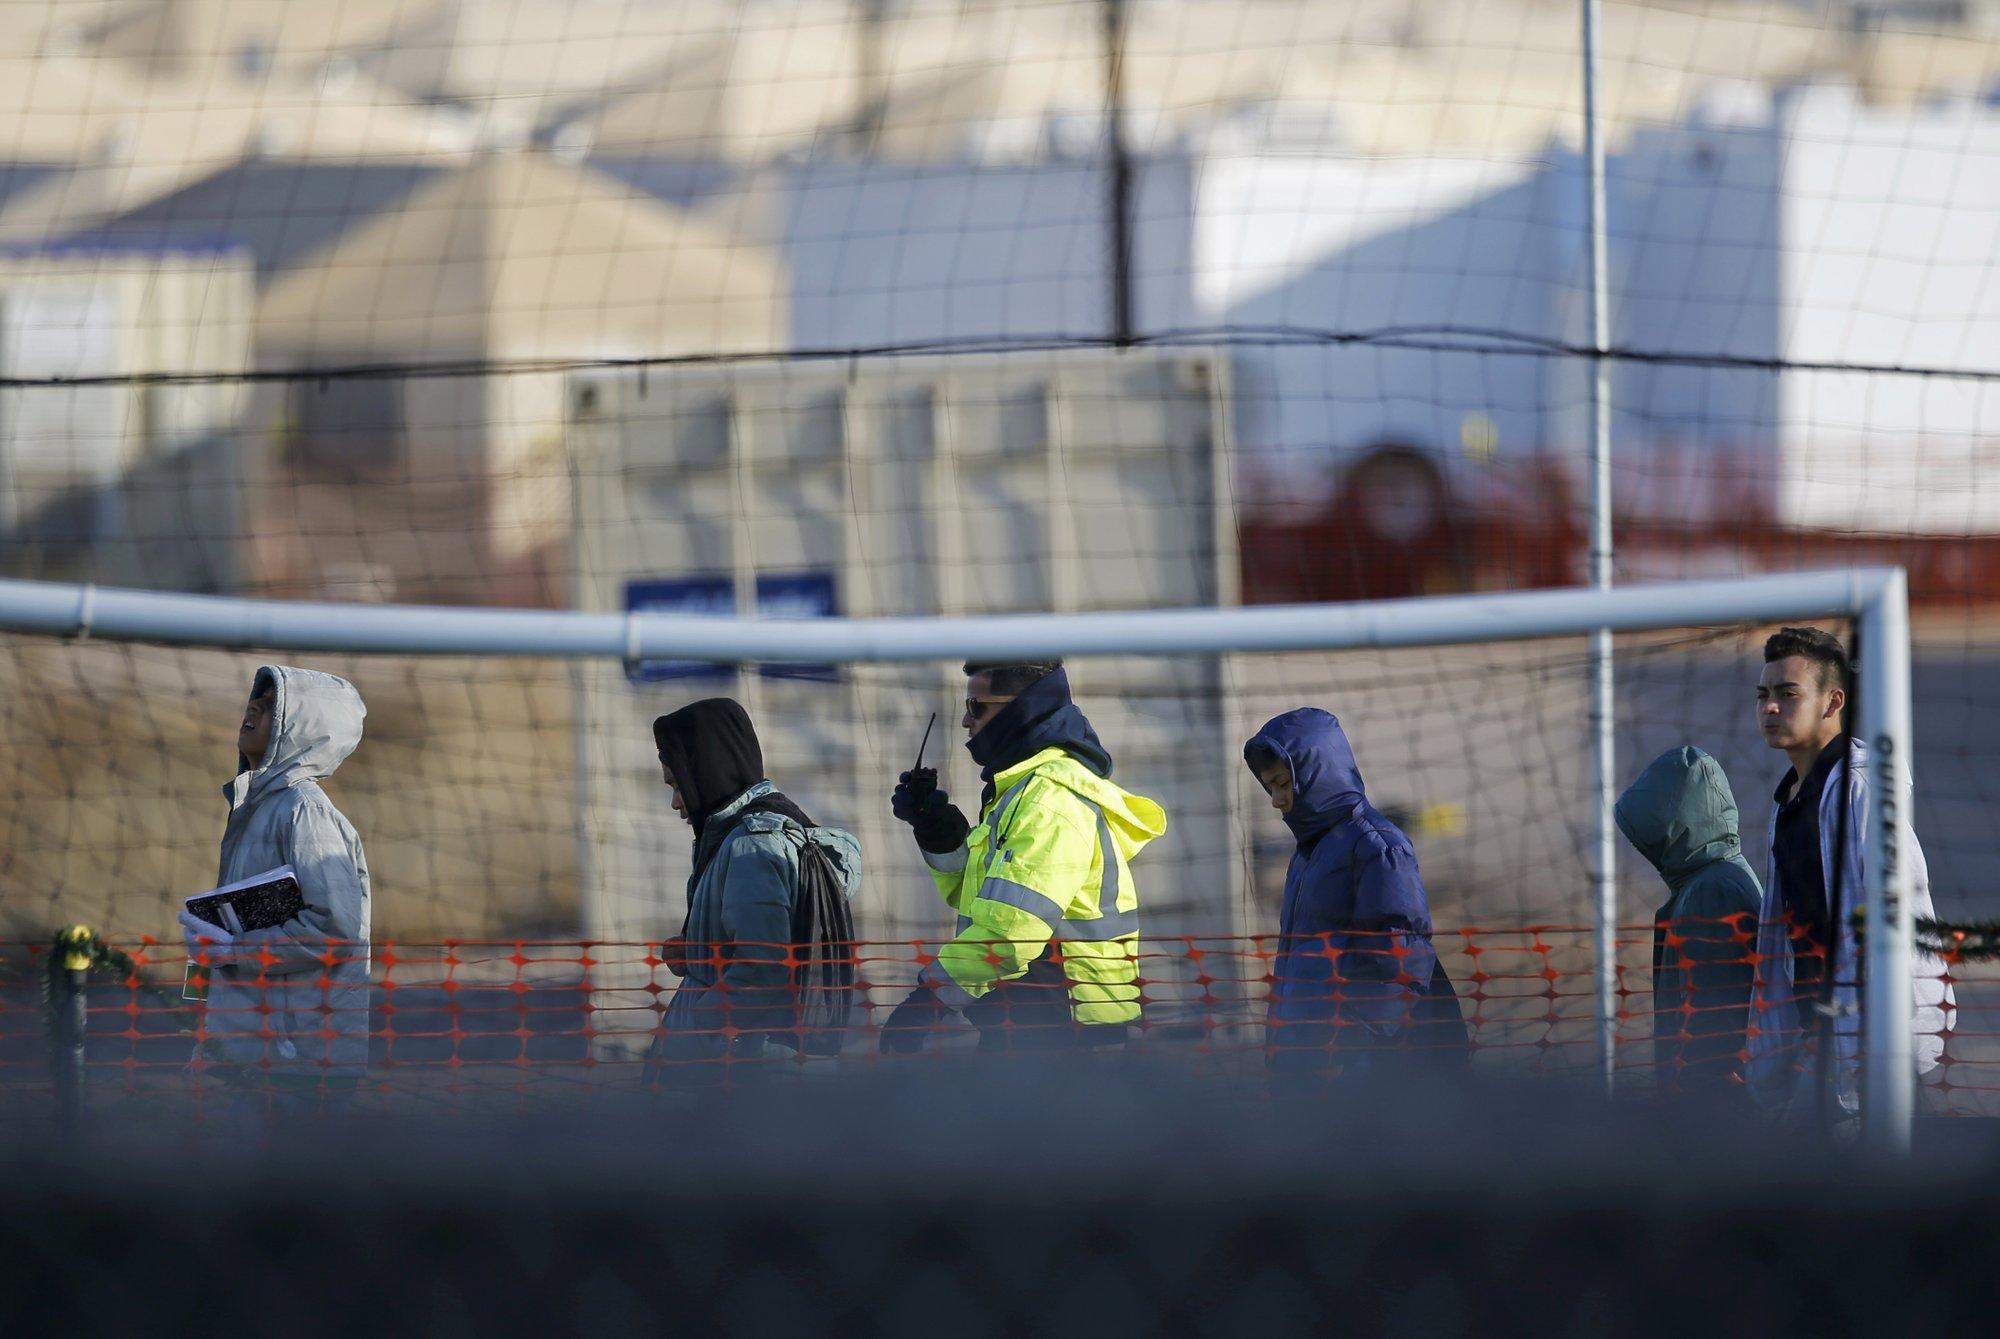 Judge gives US 6 months to identify children split at border